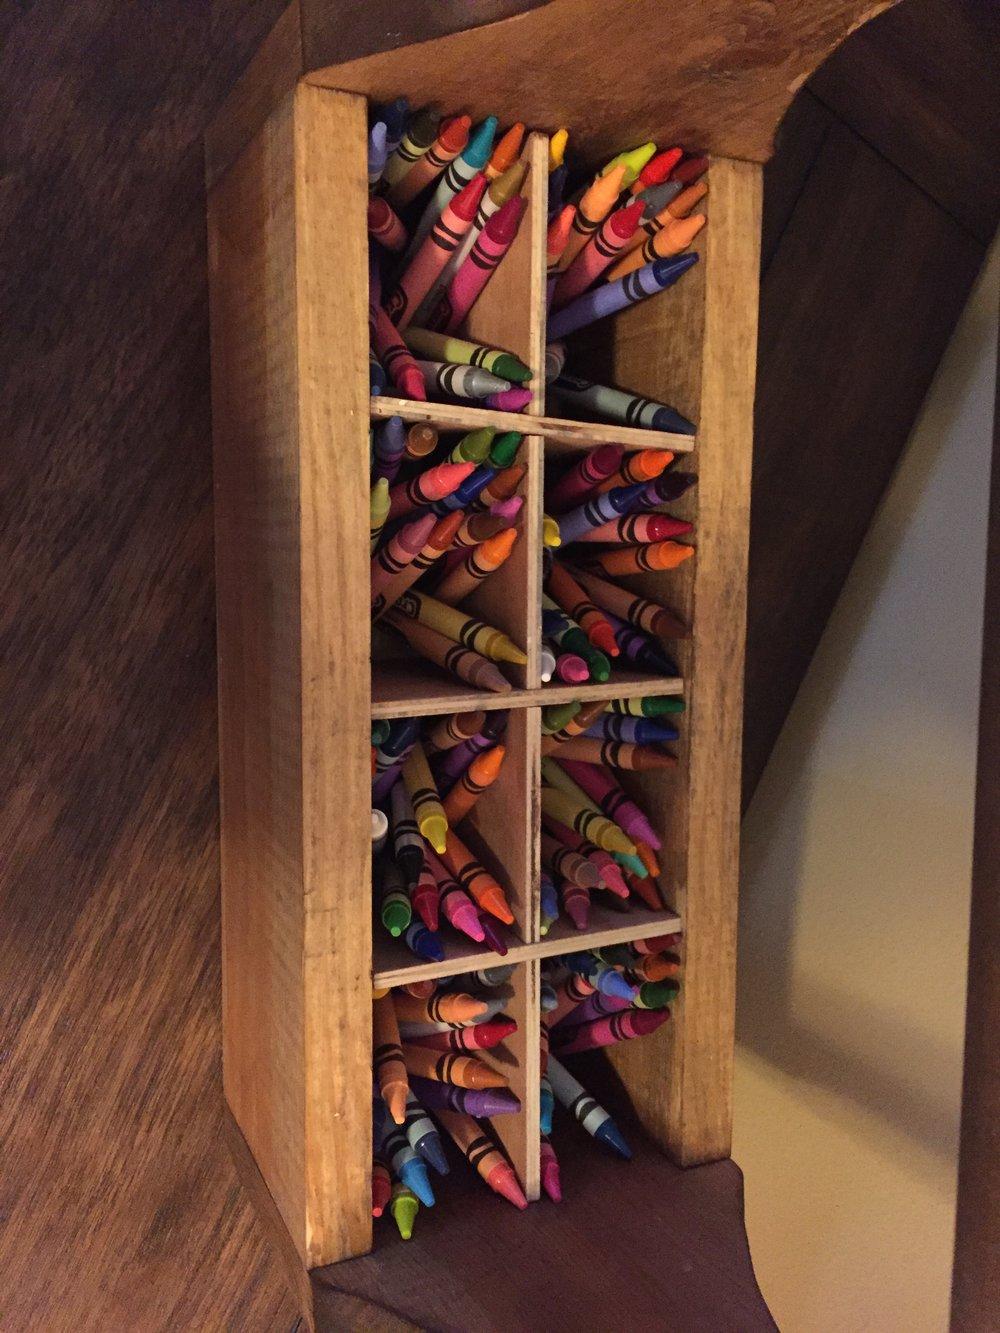 crayon-box-inside.jpg